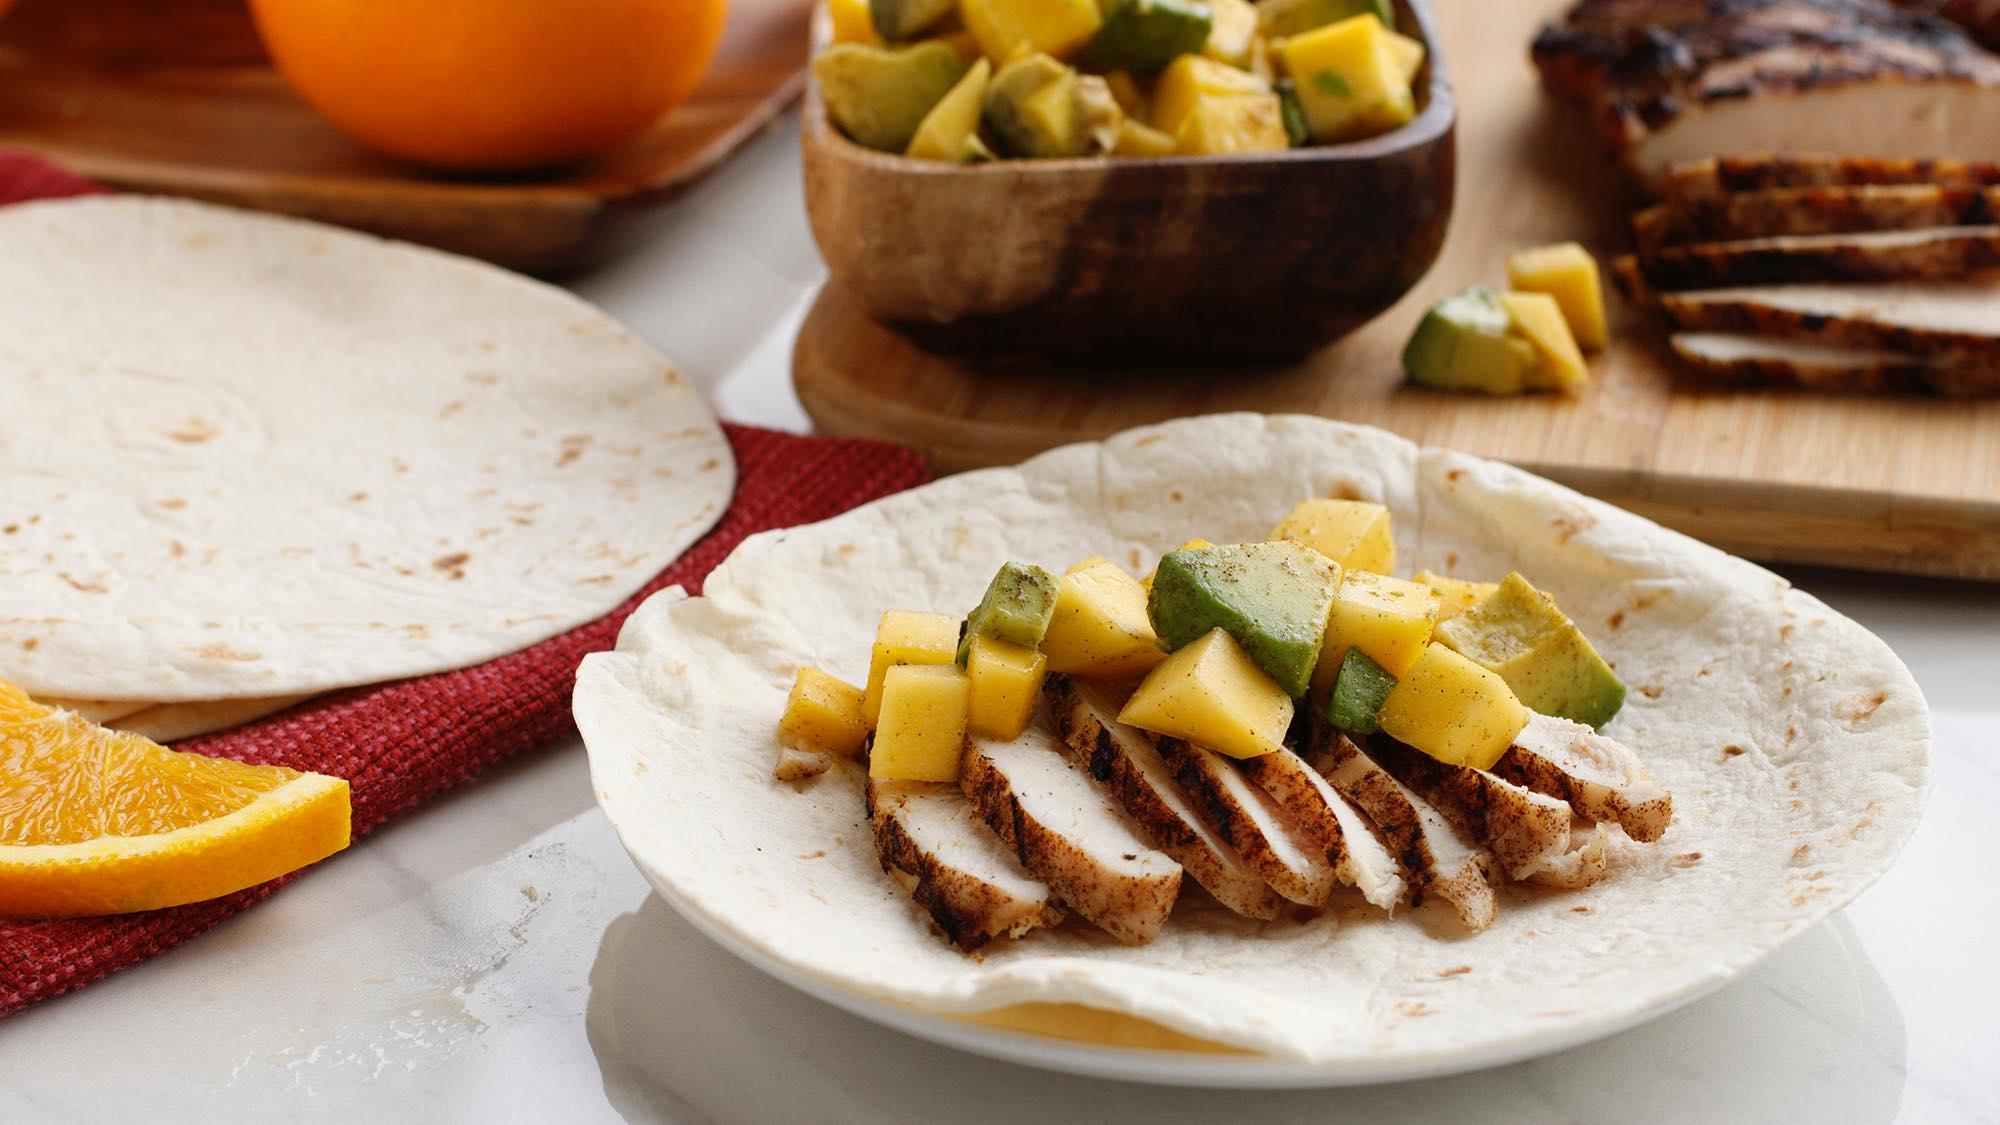 cuban_mojo_chicken_tacos_recipes_2000x1125.jpg